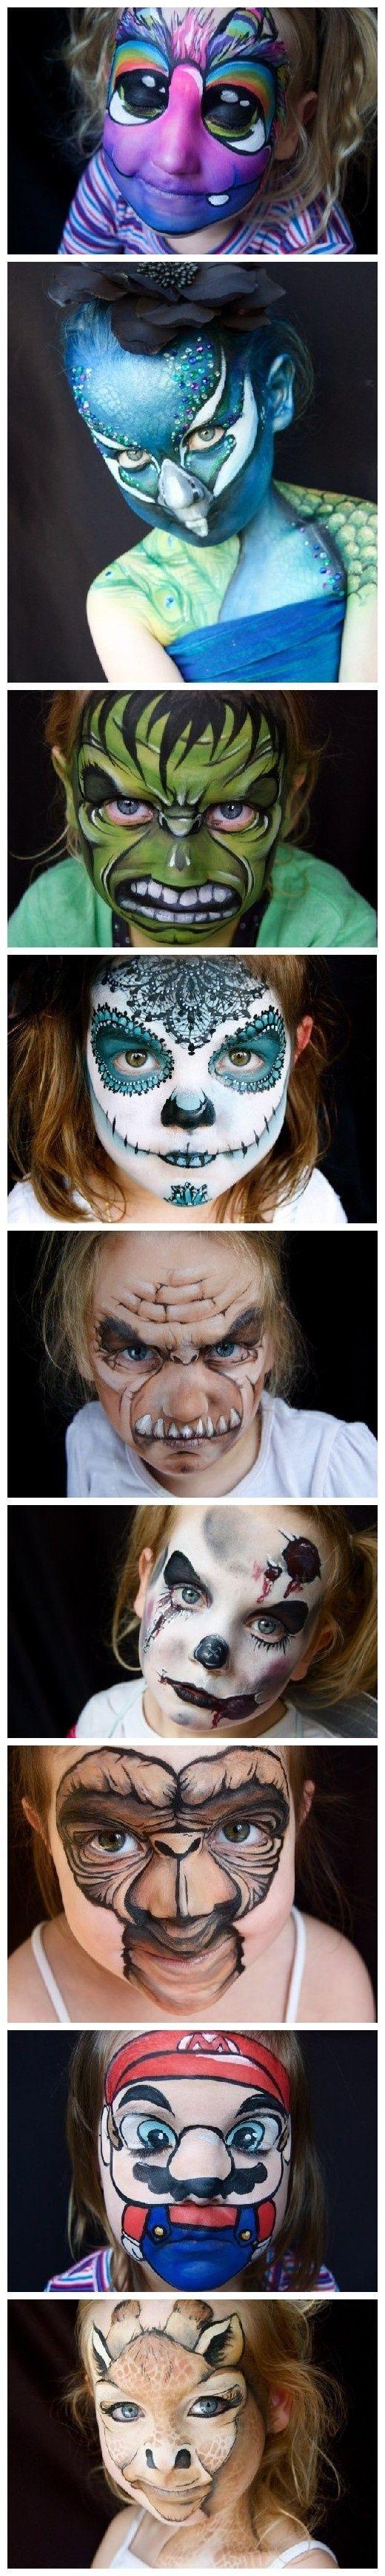 face Painted #Halloween #Halloween #halloween  http://welcometohalloween.lemoncoin.org